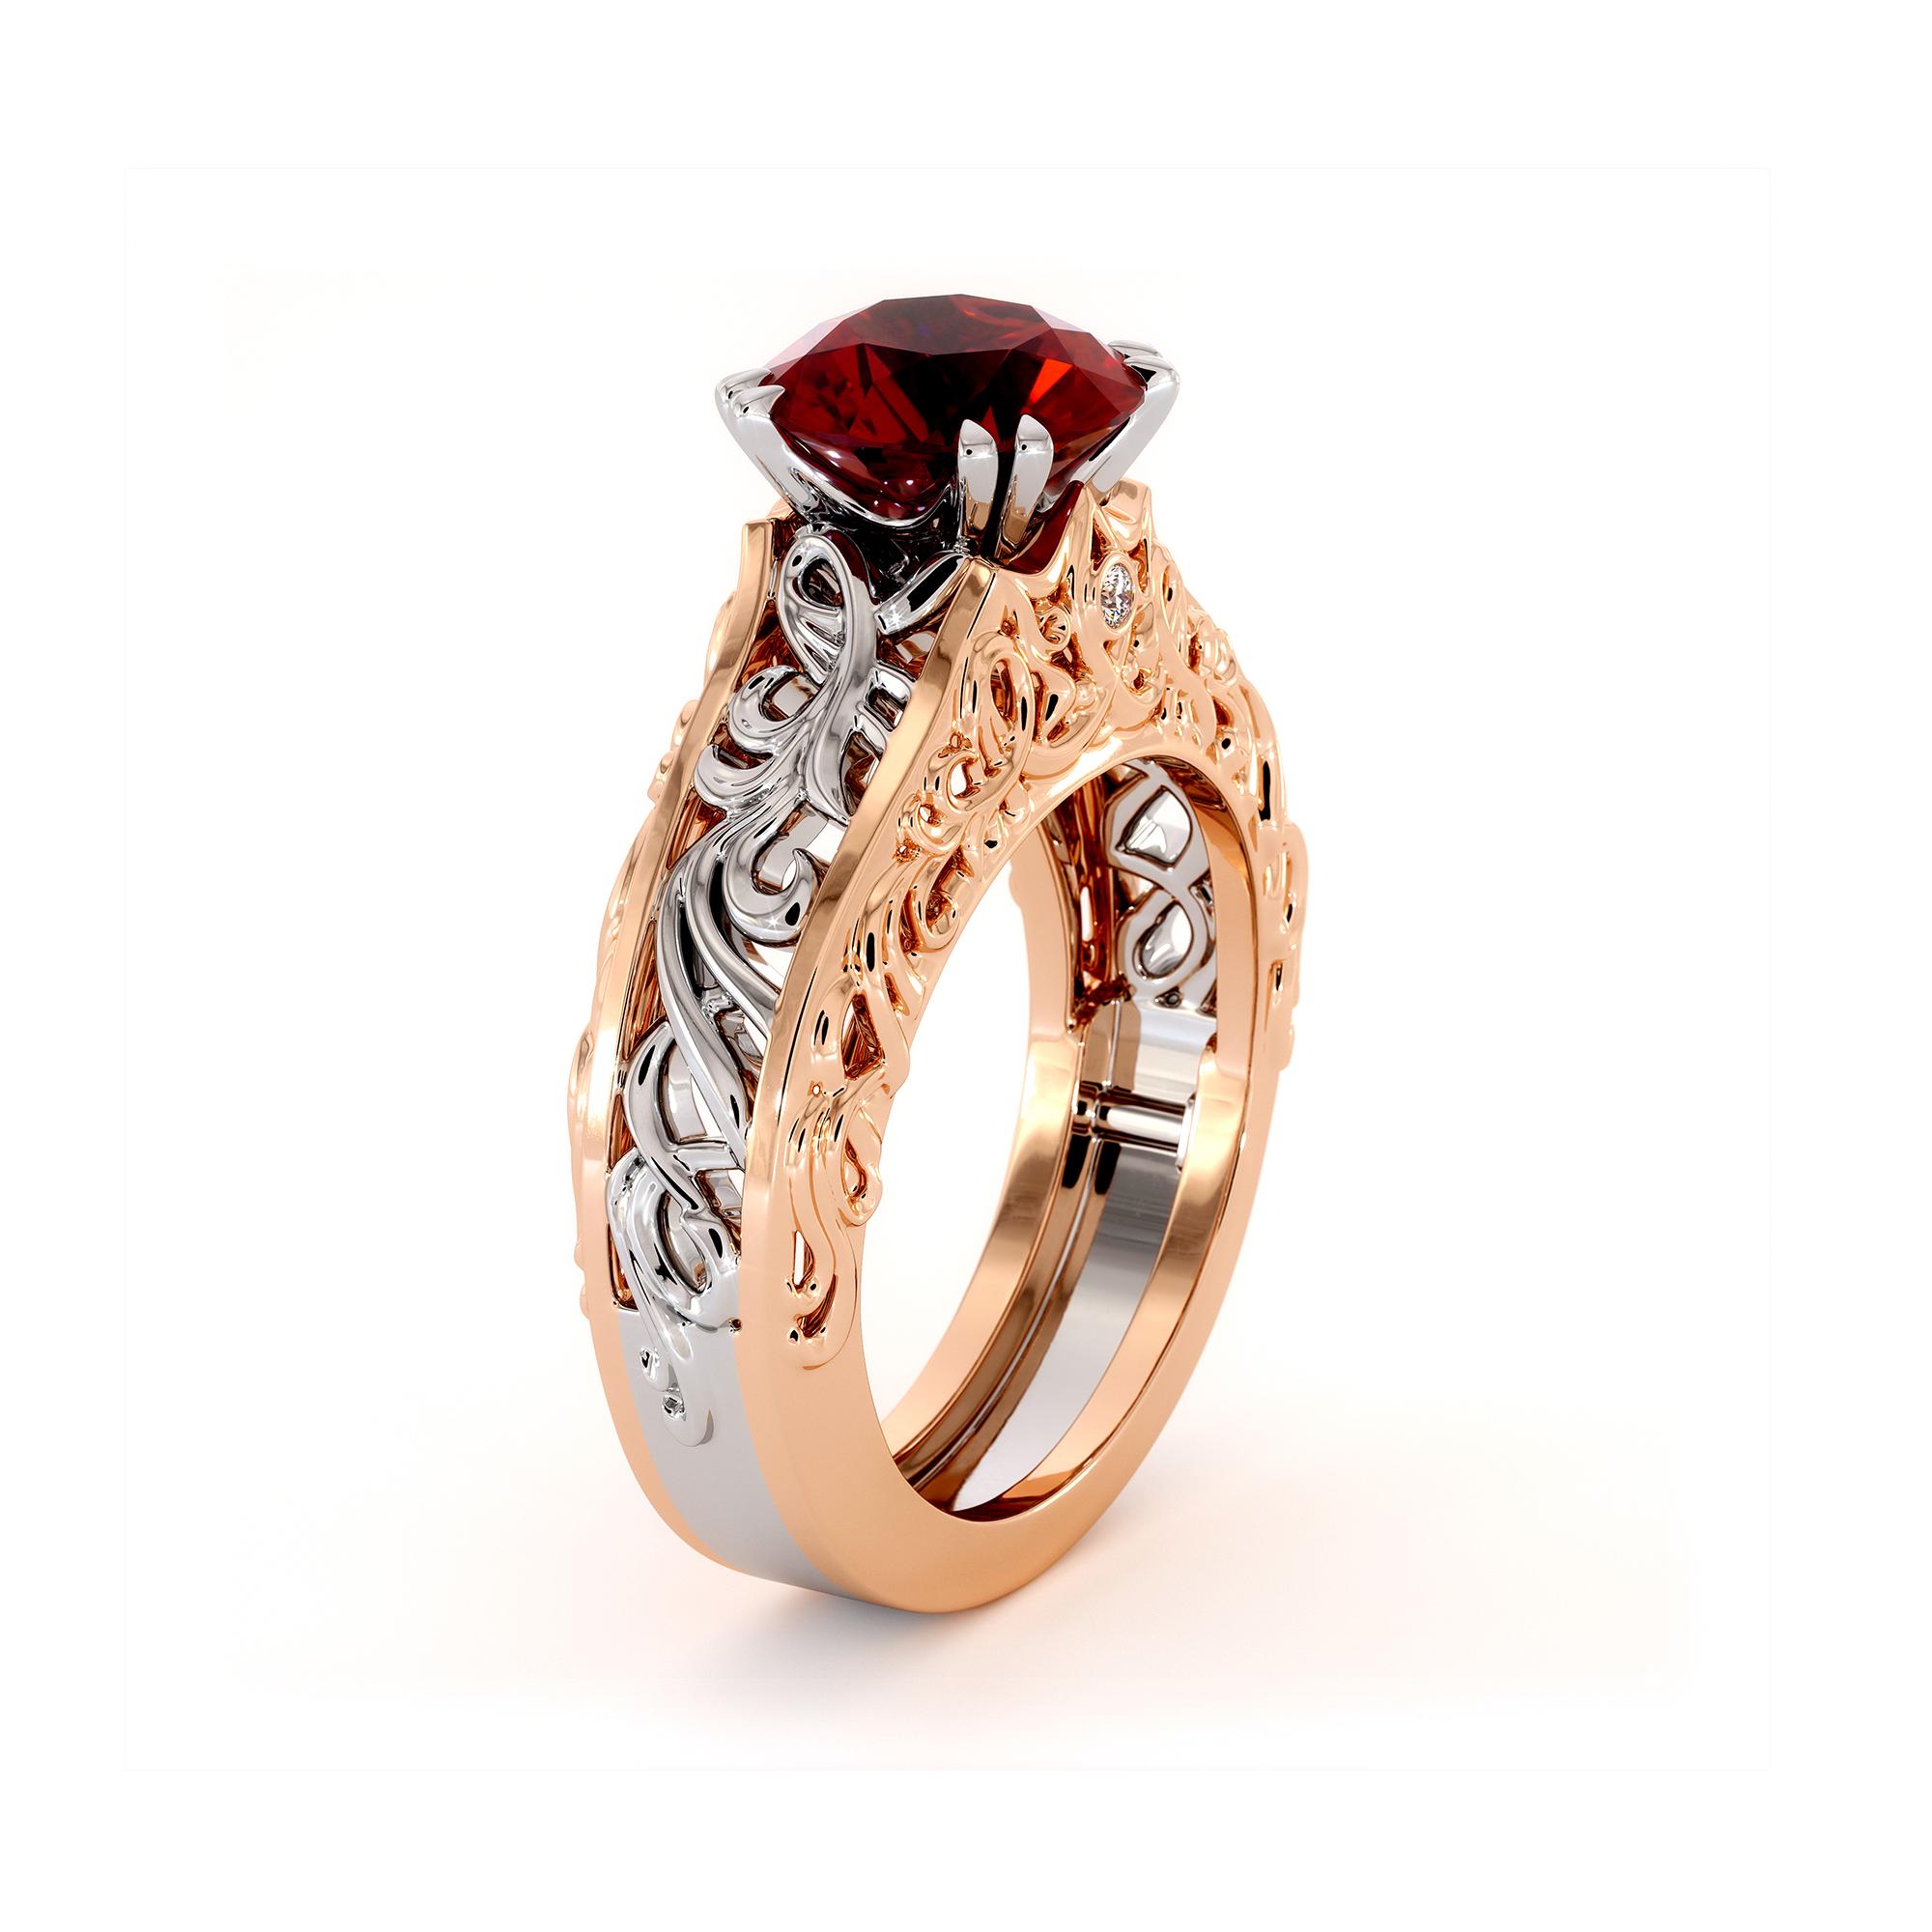 Natural Ruby 2 Tone Gold Filigree Splendid Royal Engagement Ring